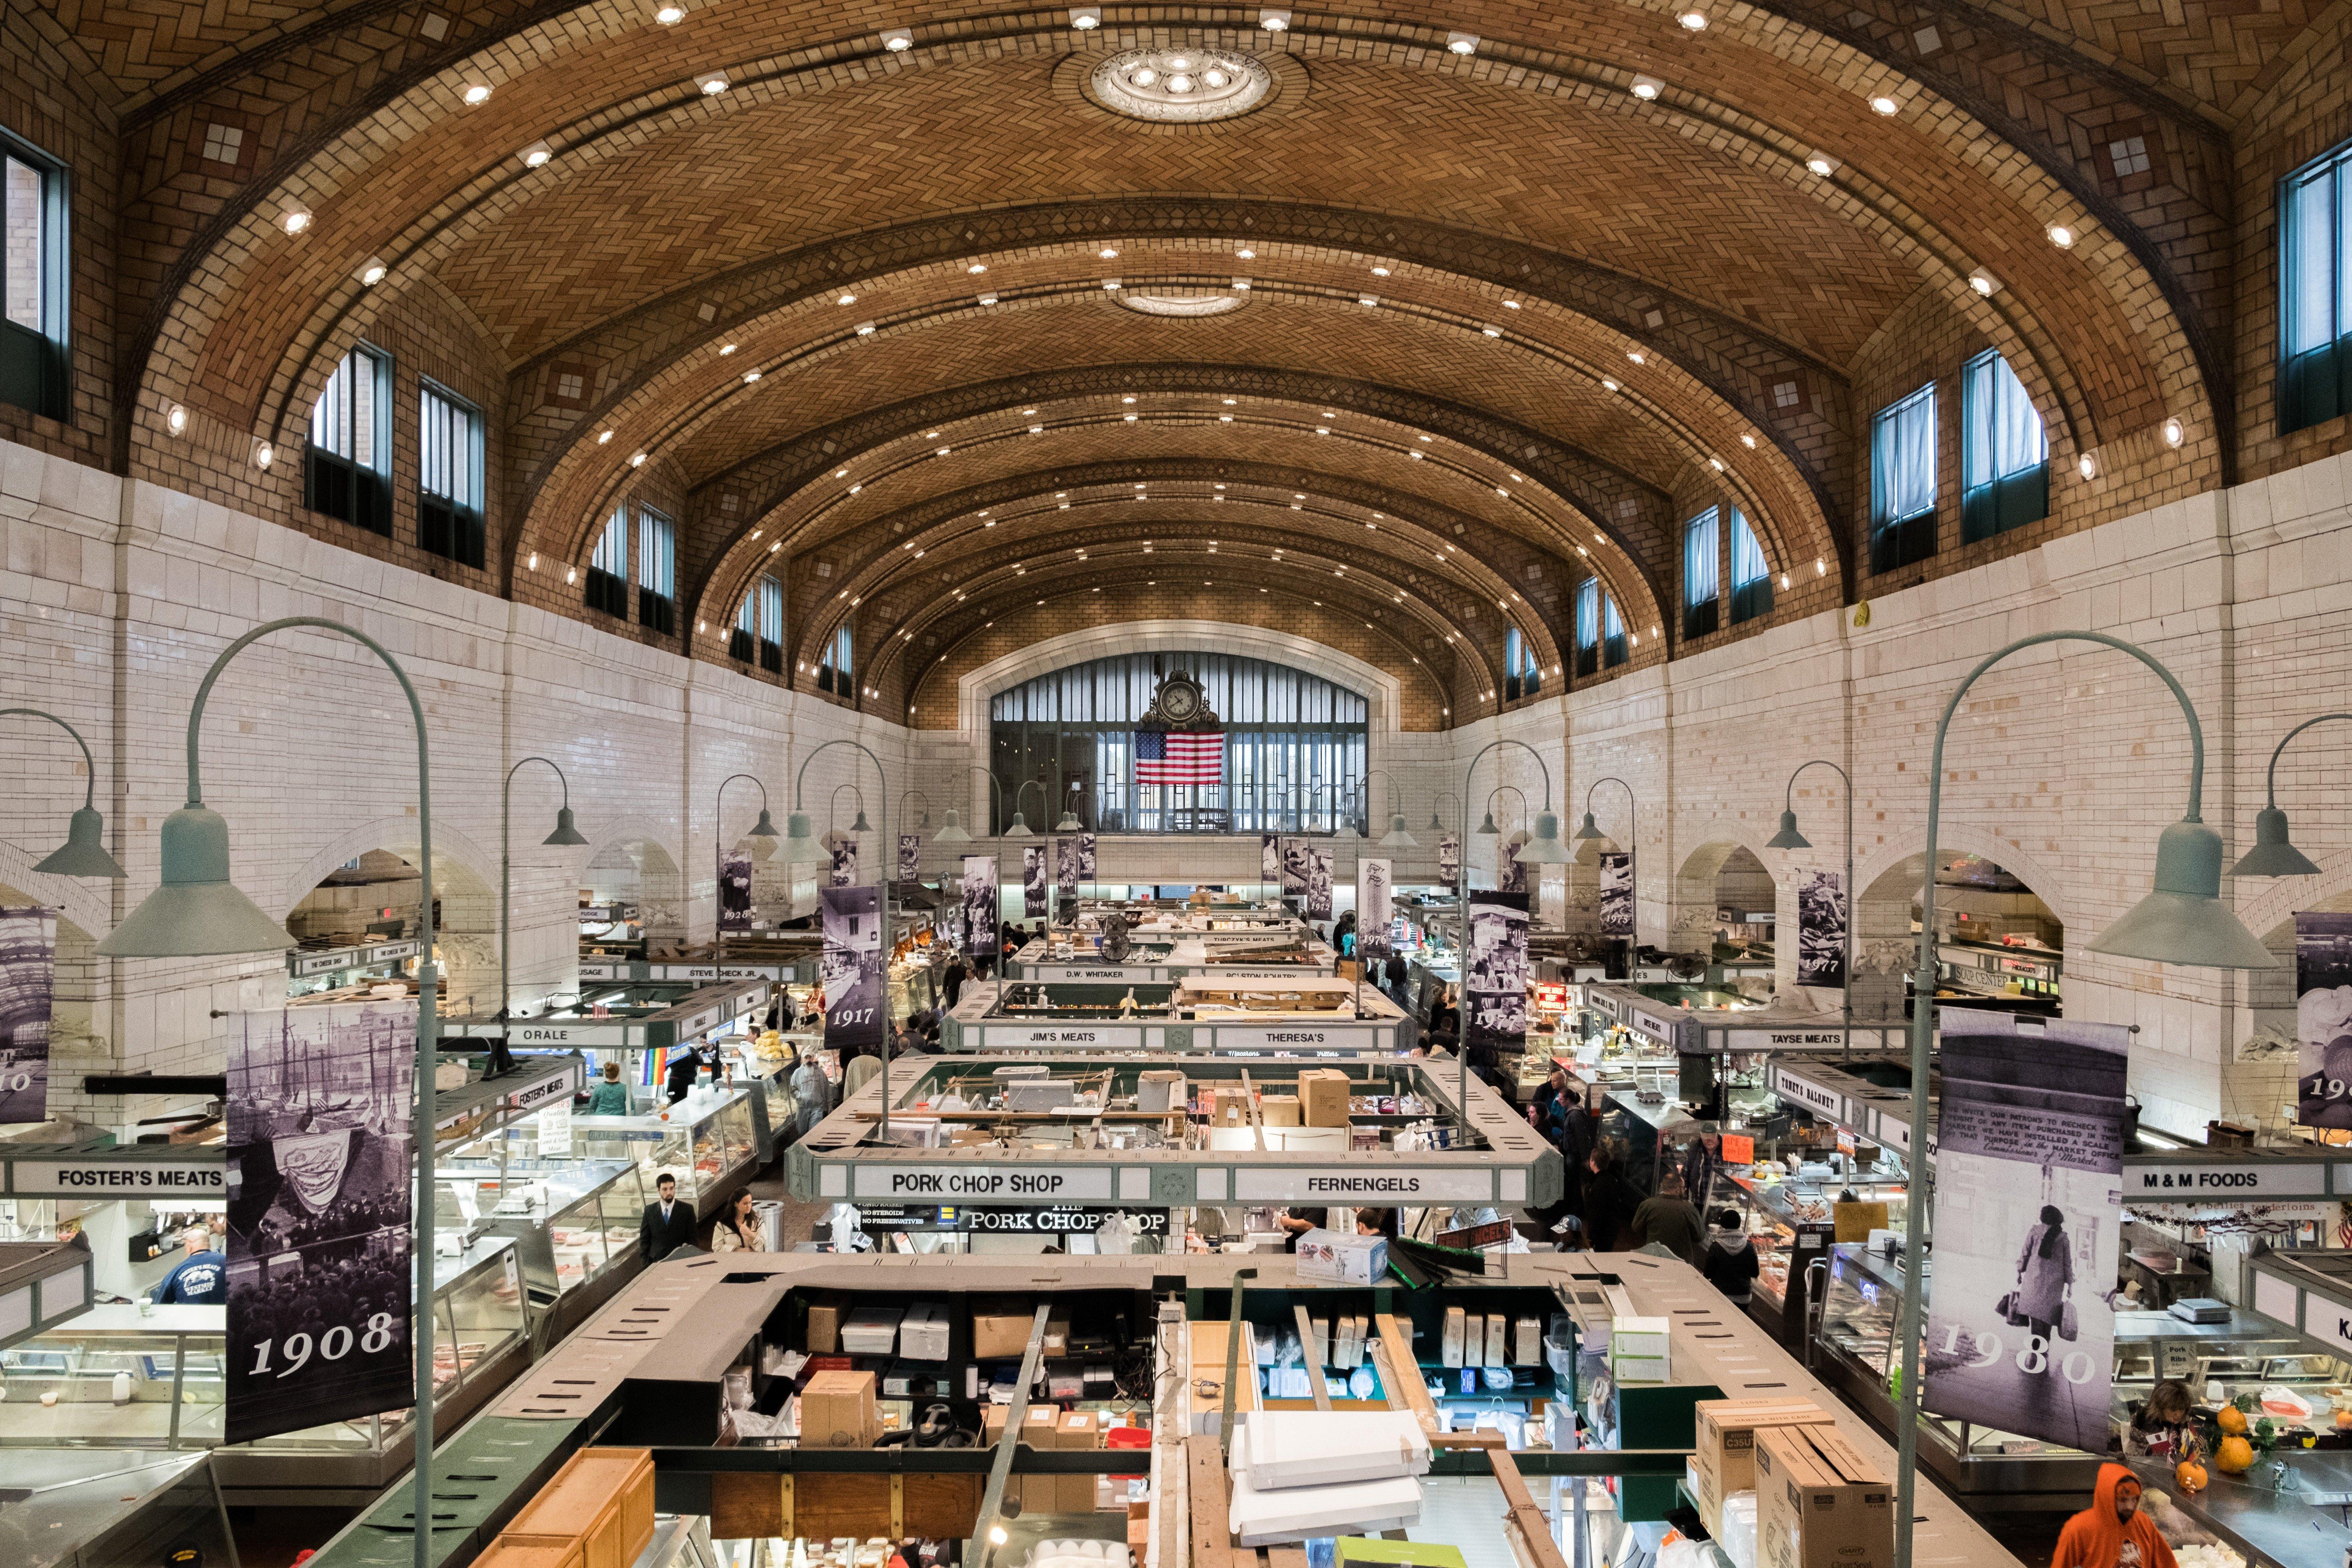 Image of the West Side Market